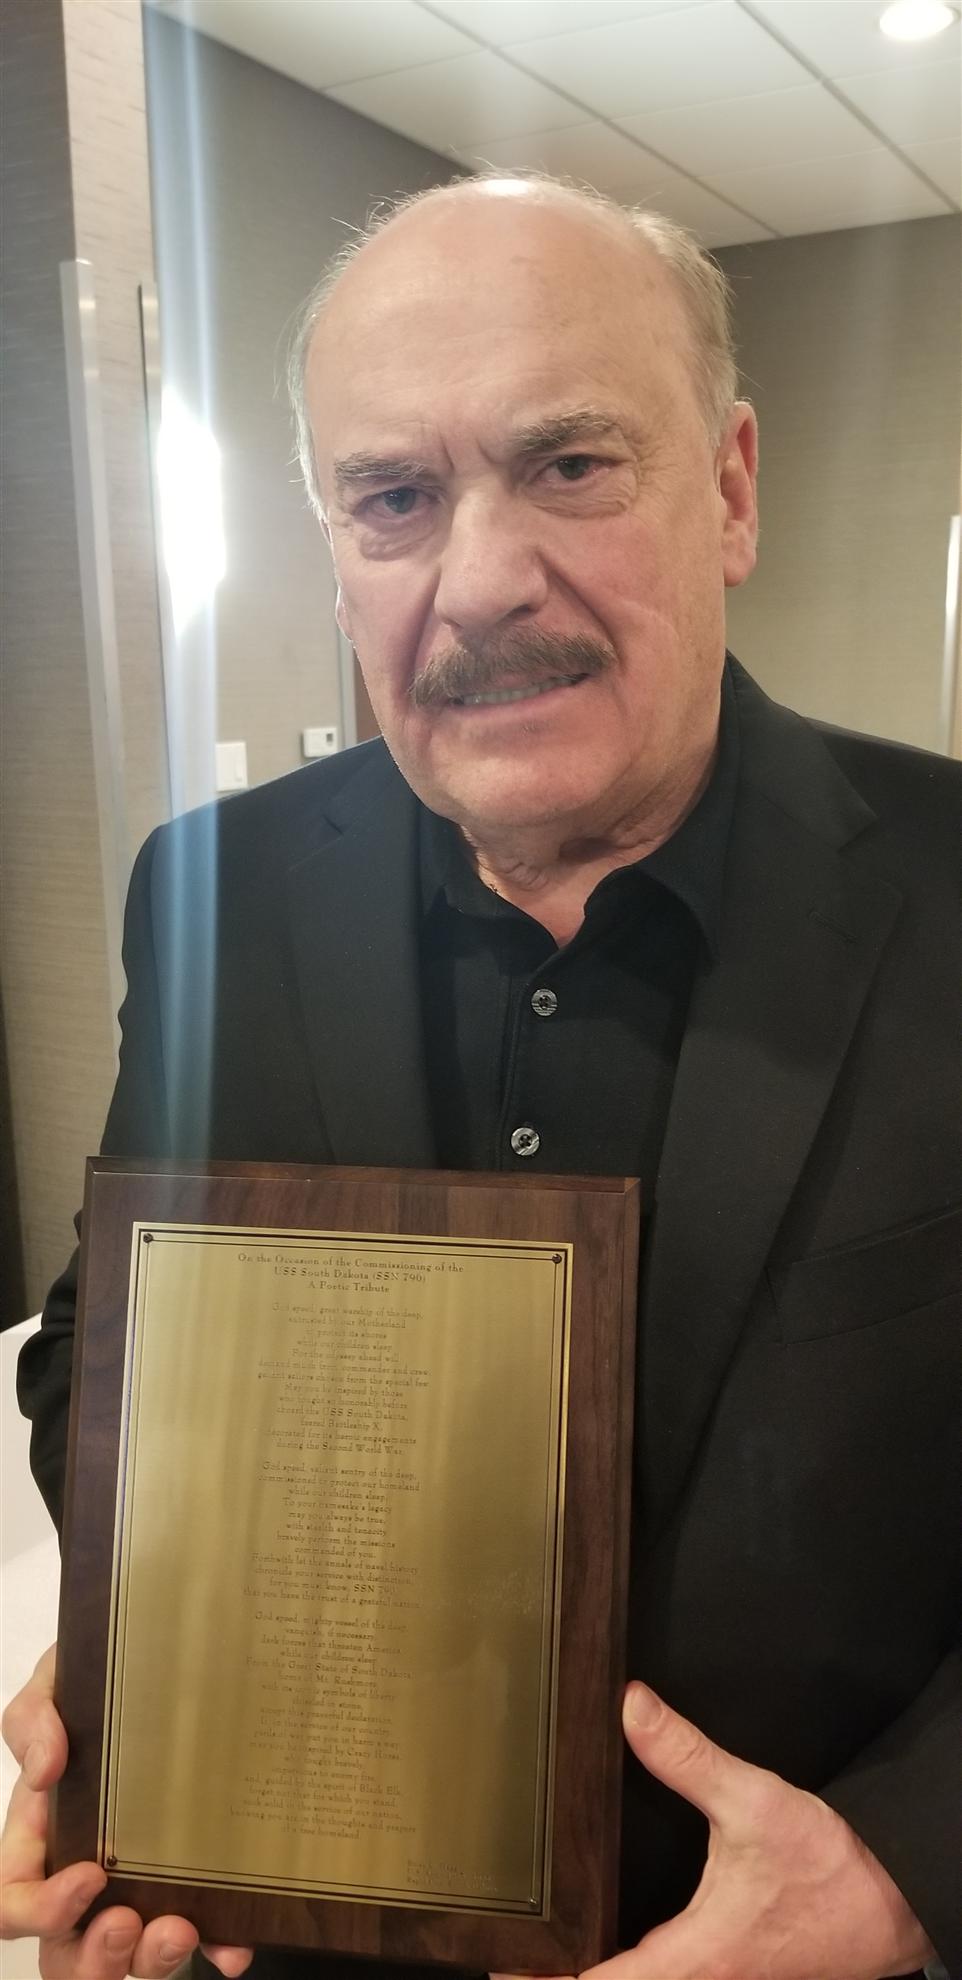 Brian Hagg with Commemorative USS South Dakota poem.